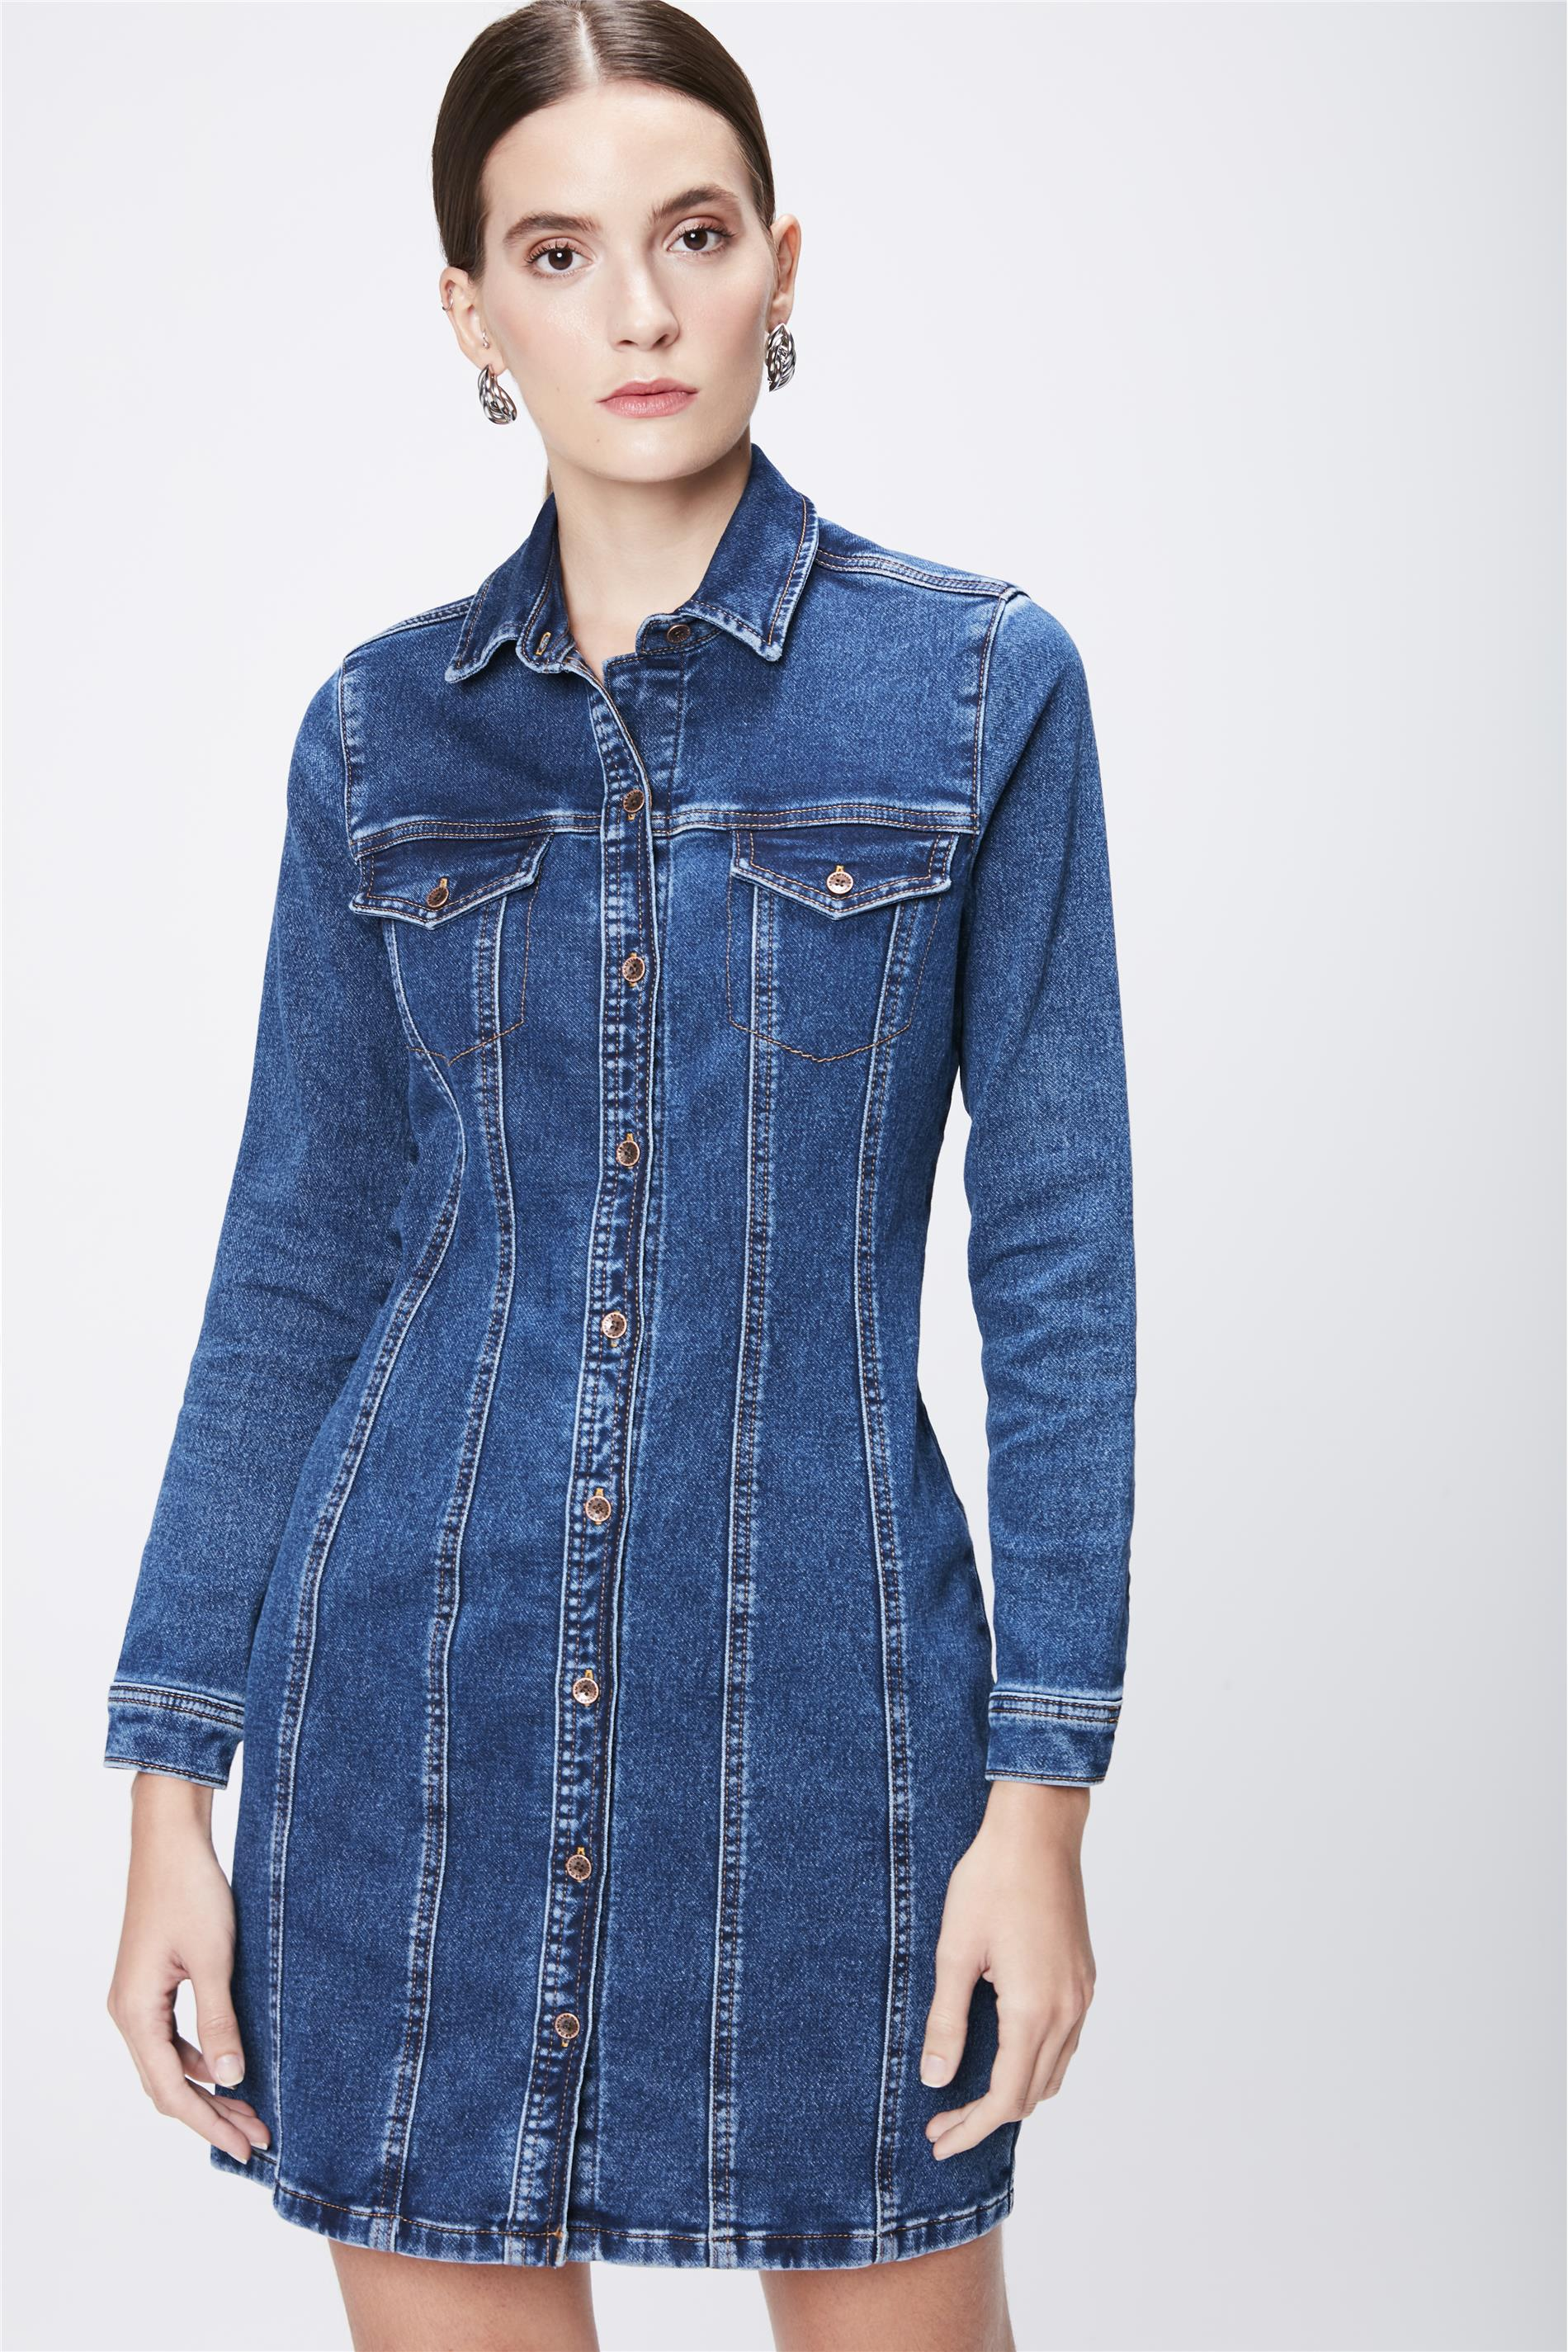 041eee211 Vestido Jeans Manga Longa - Damyller